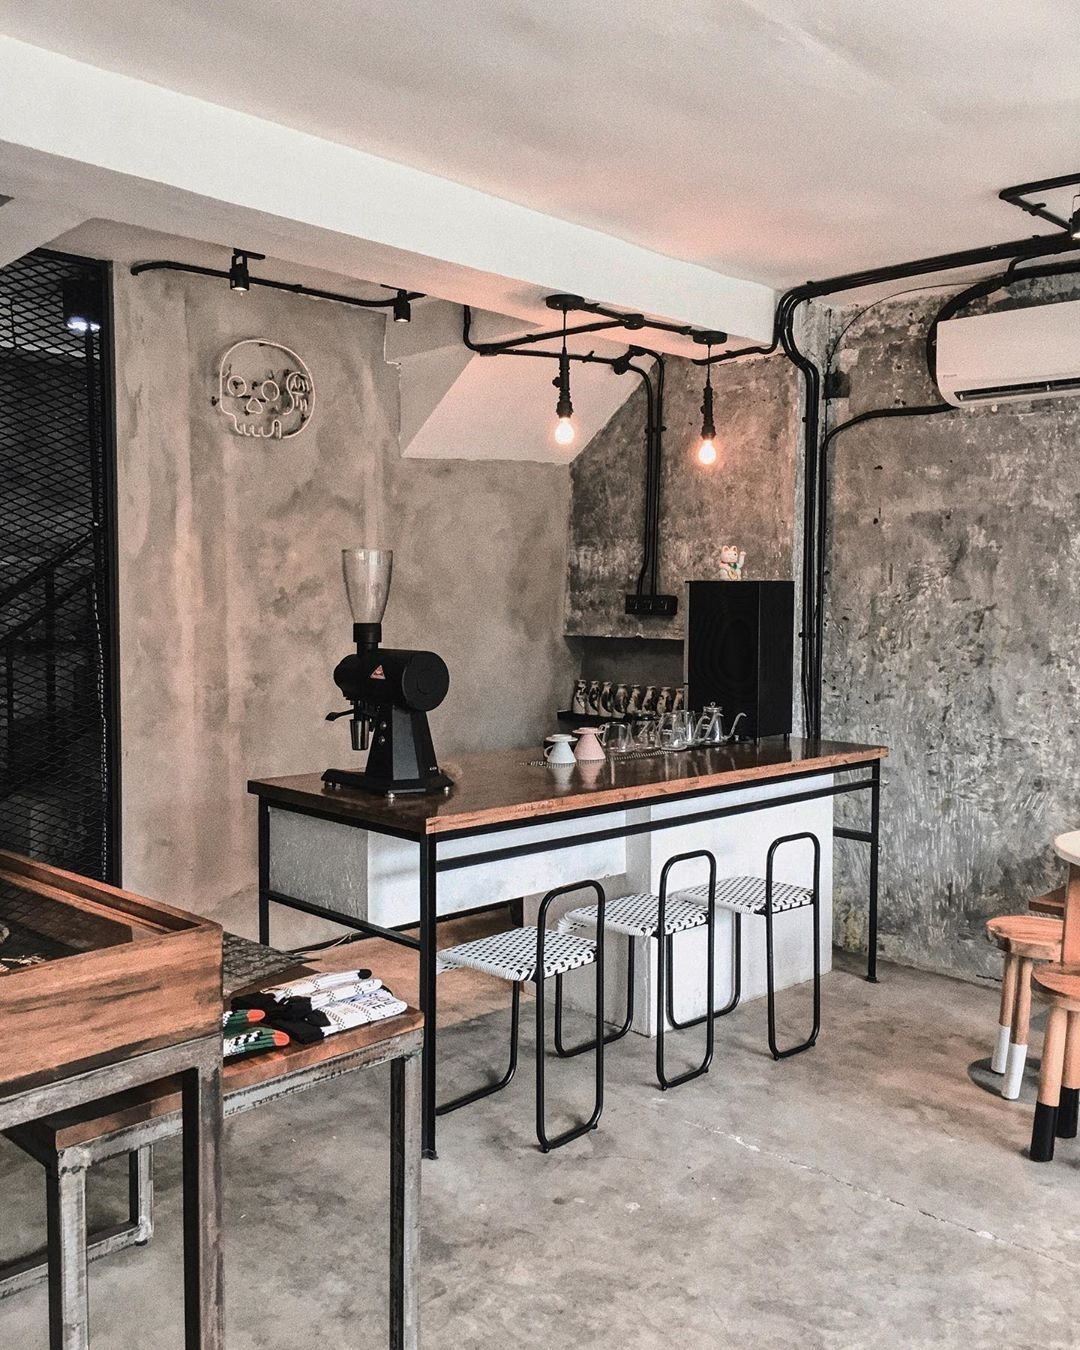 World Of Coffee On Instagram Repost Alex Sandrrr Coffeeshop Coffeecorner Coffeetime Coffee Shops Interior Brew Bar Industrial Coffee Shop